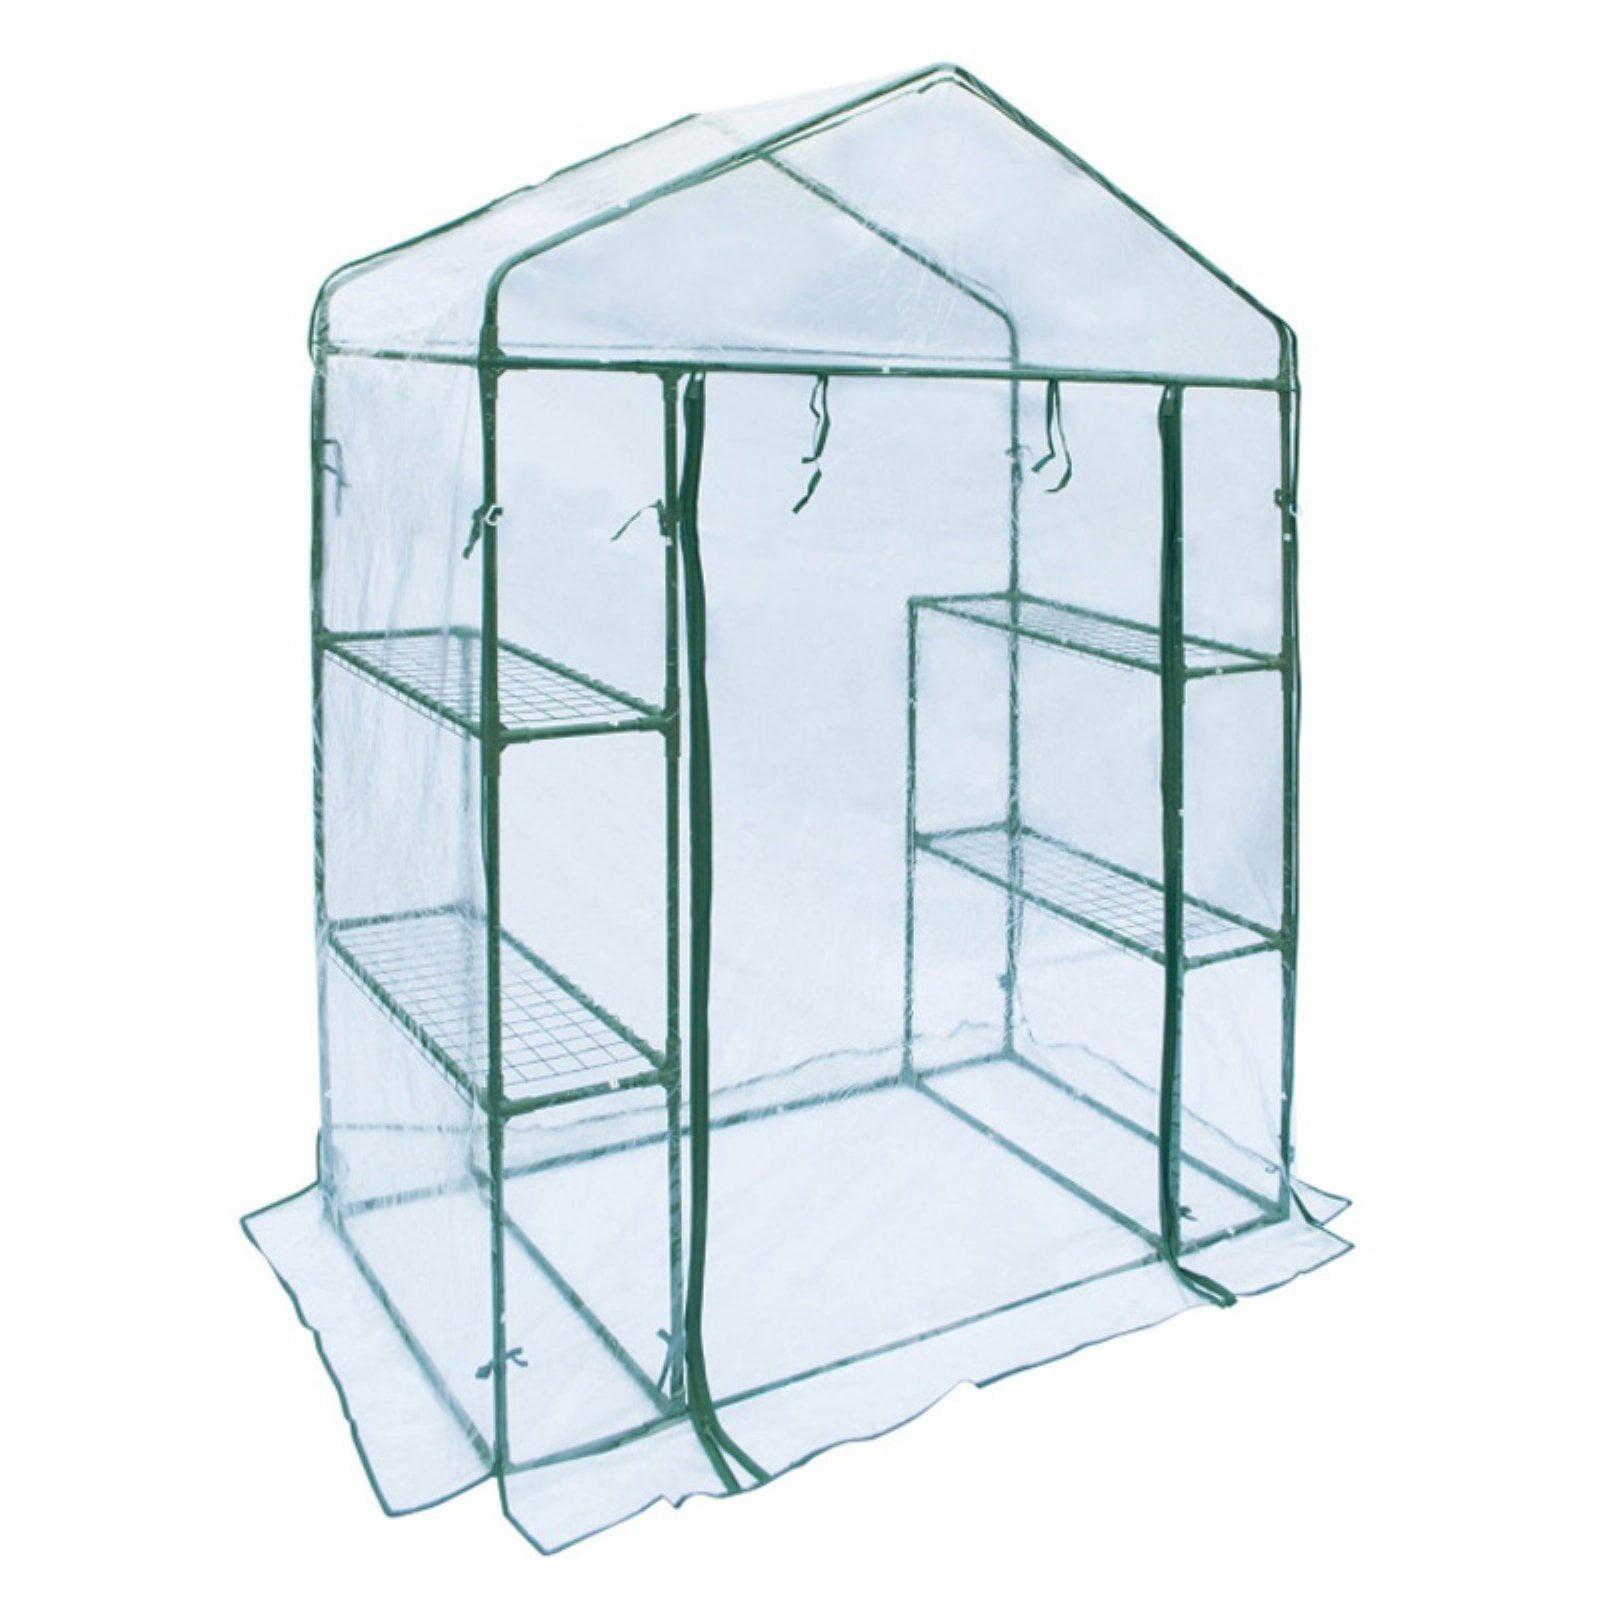 ALEKO Transparent Walk-In 4-Shelves Garden Plant Outdoor Greenhouse Shed by ALEKO